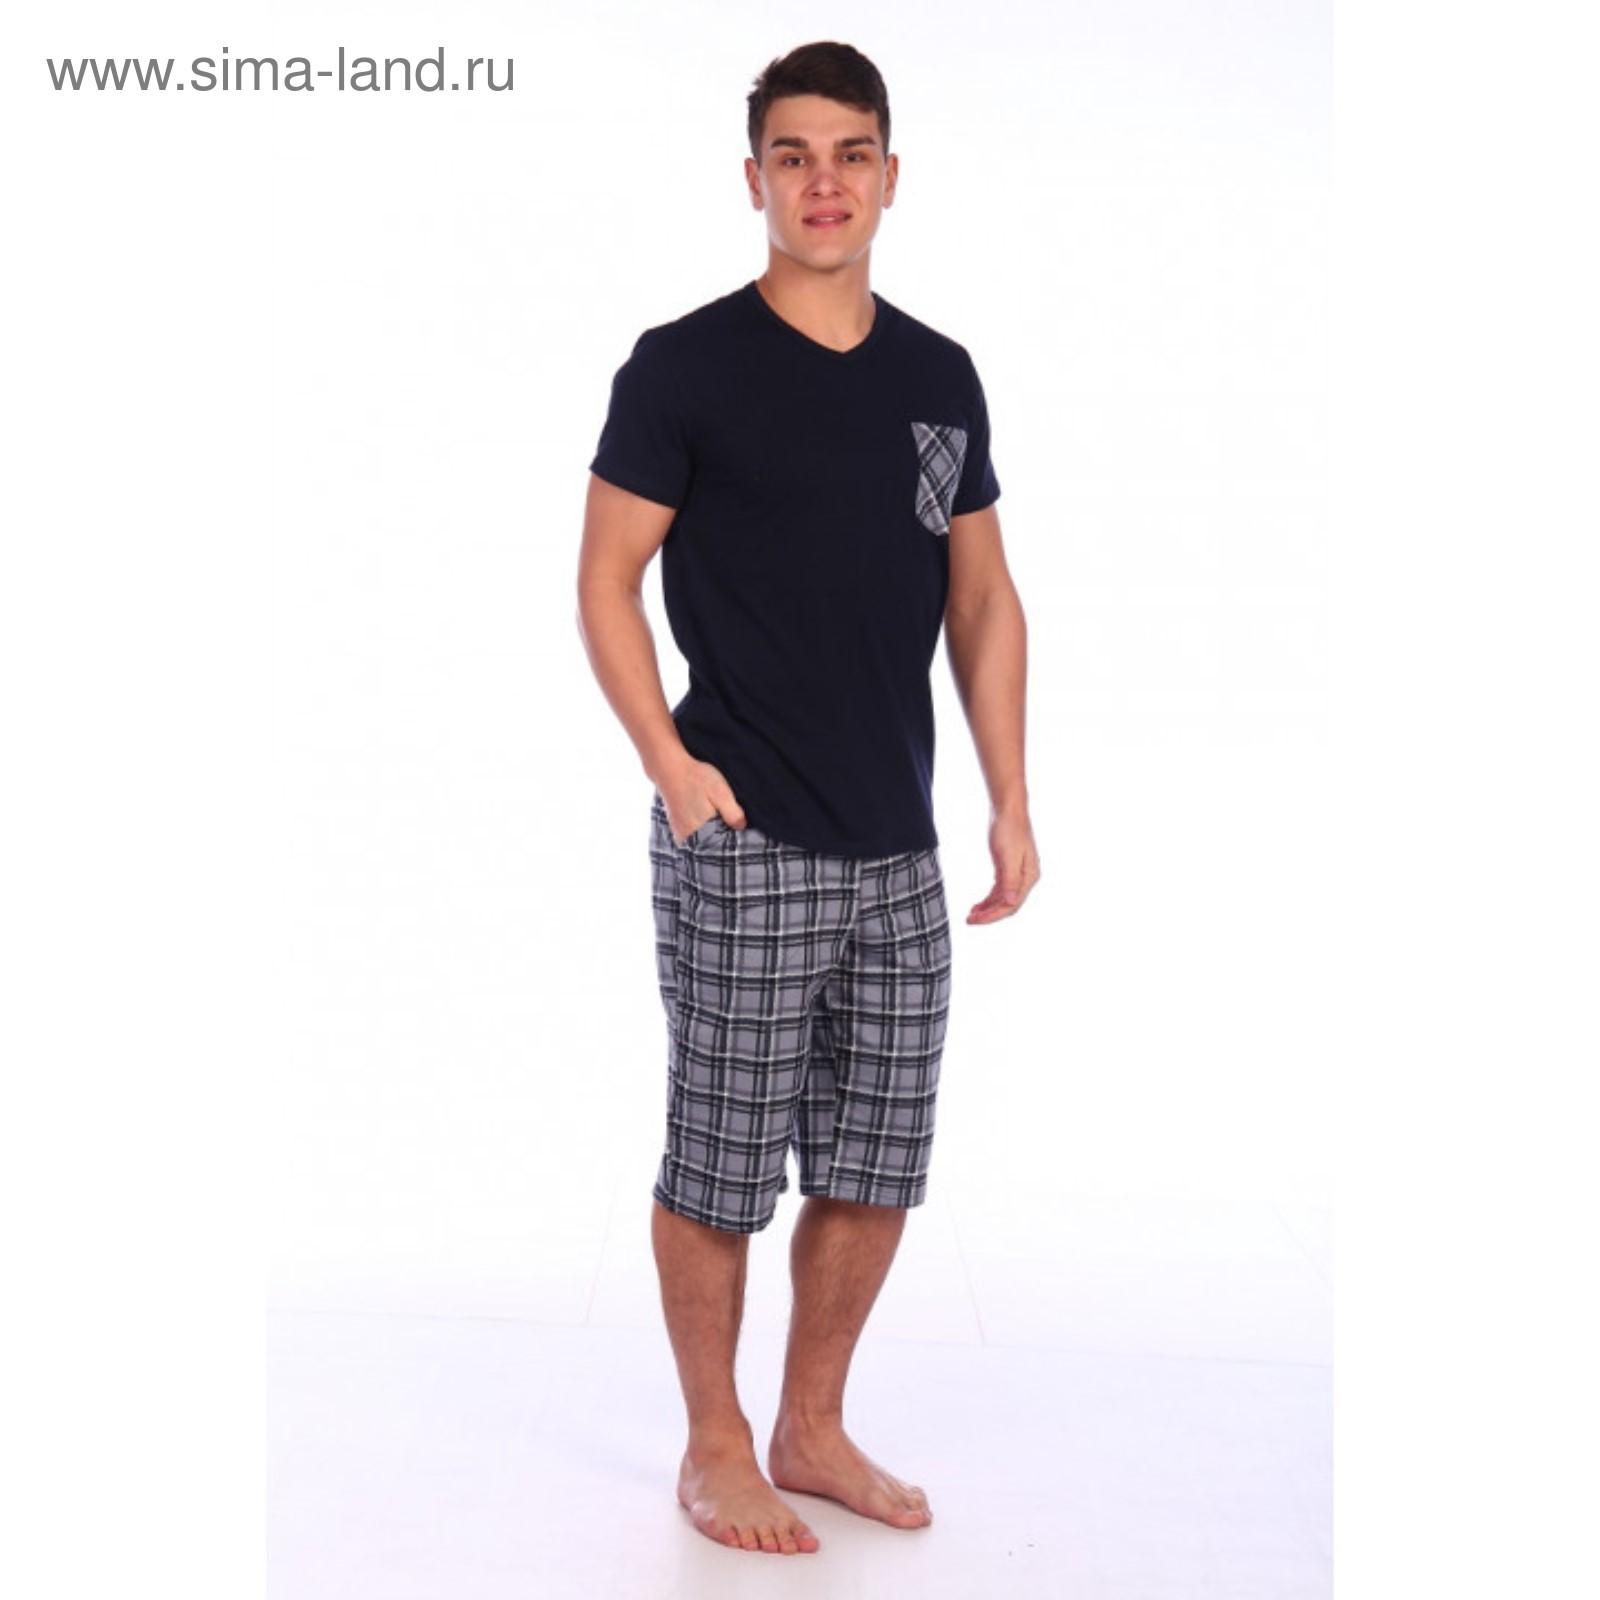 eb152187f8d5 Костюм мужской (футболка, шорты), цвет тёмно-синий, р-р 46 (КК319 ...